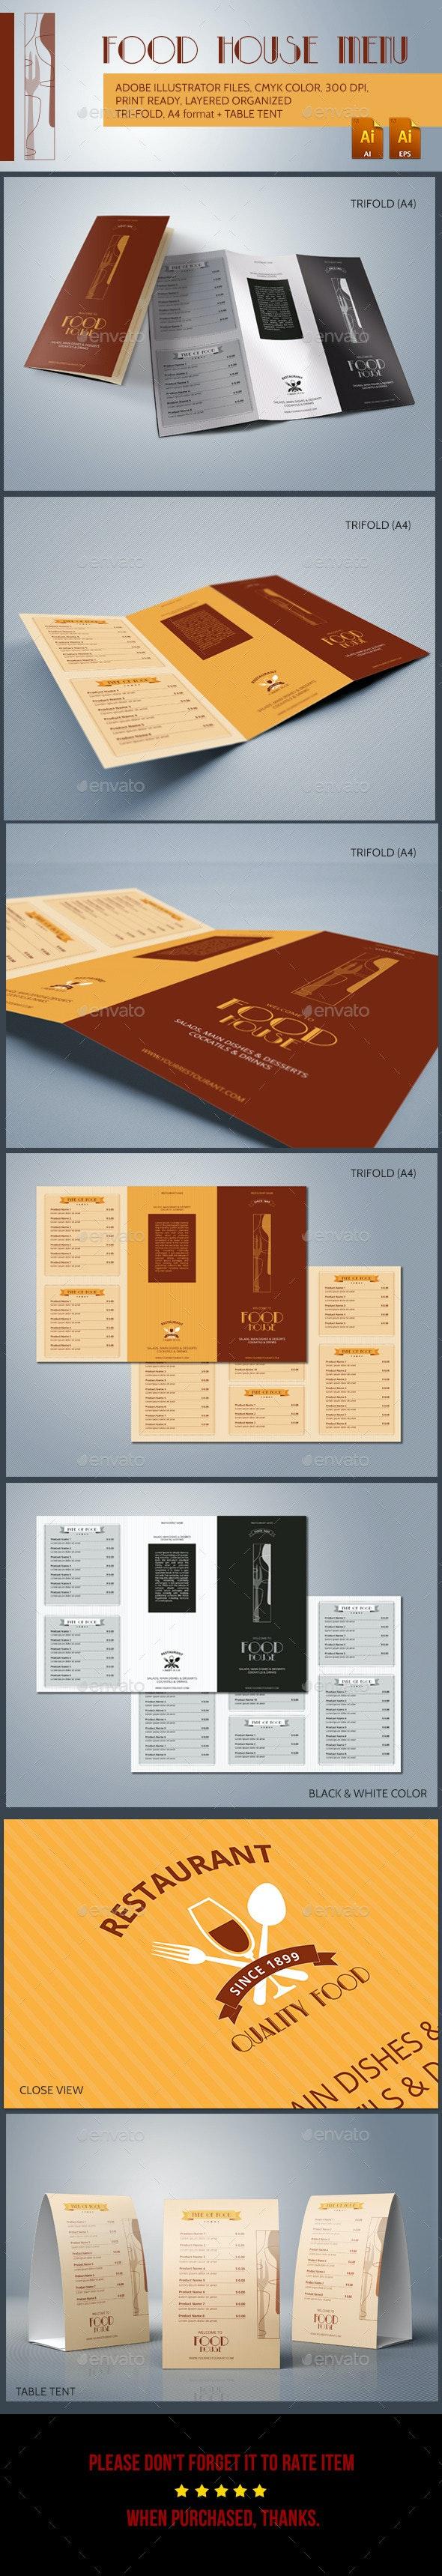 Food House Menu - Food Menus Print Templates